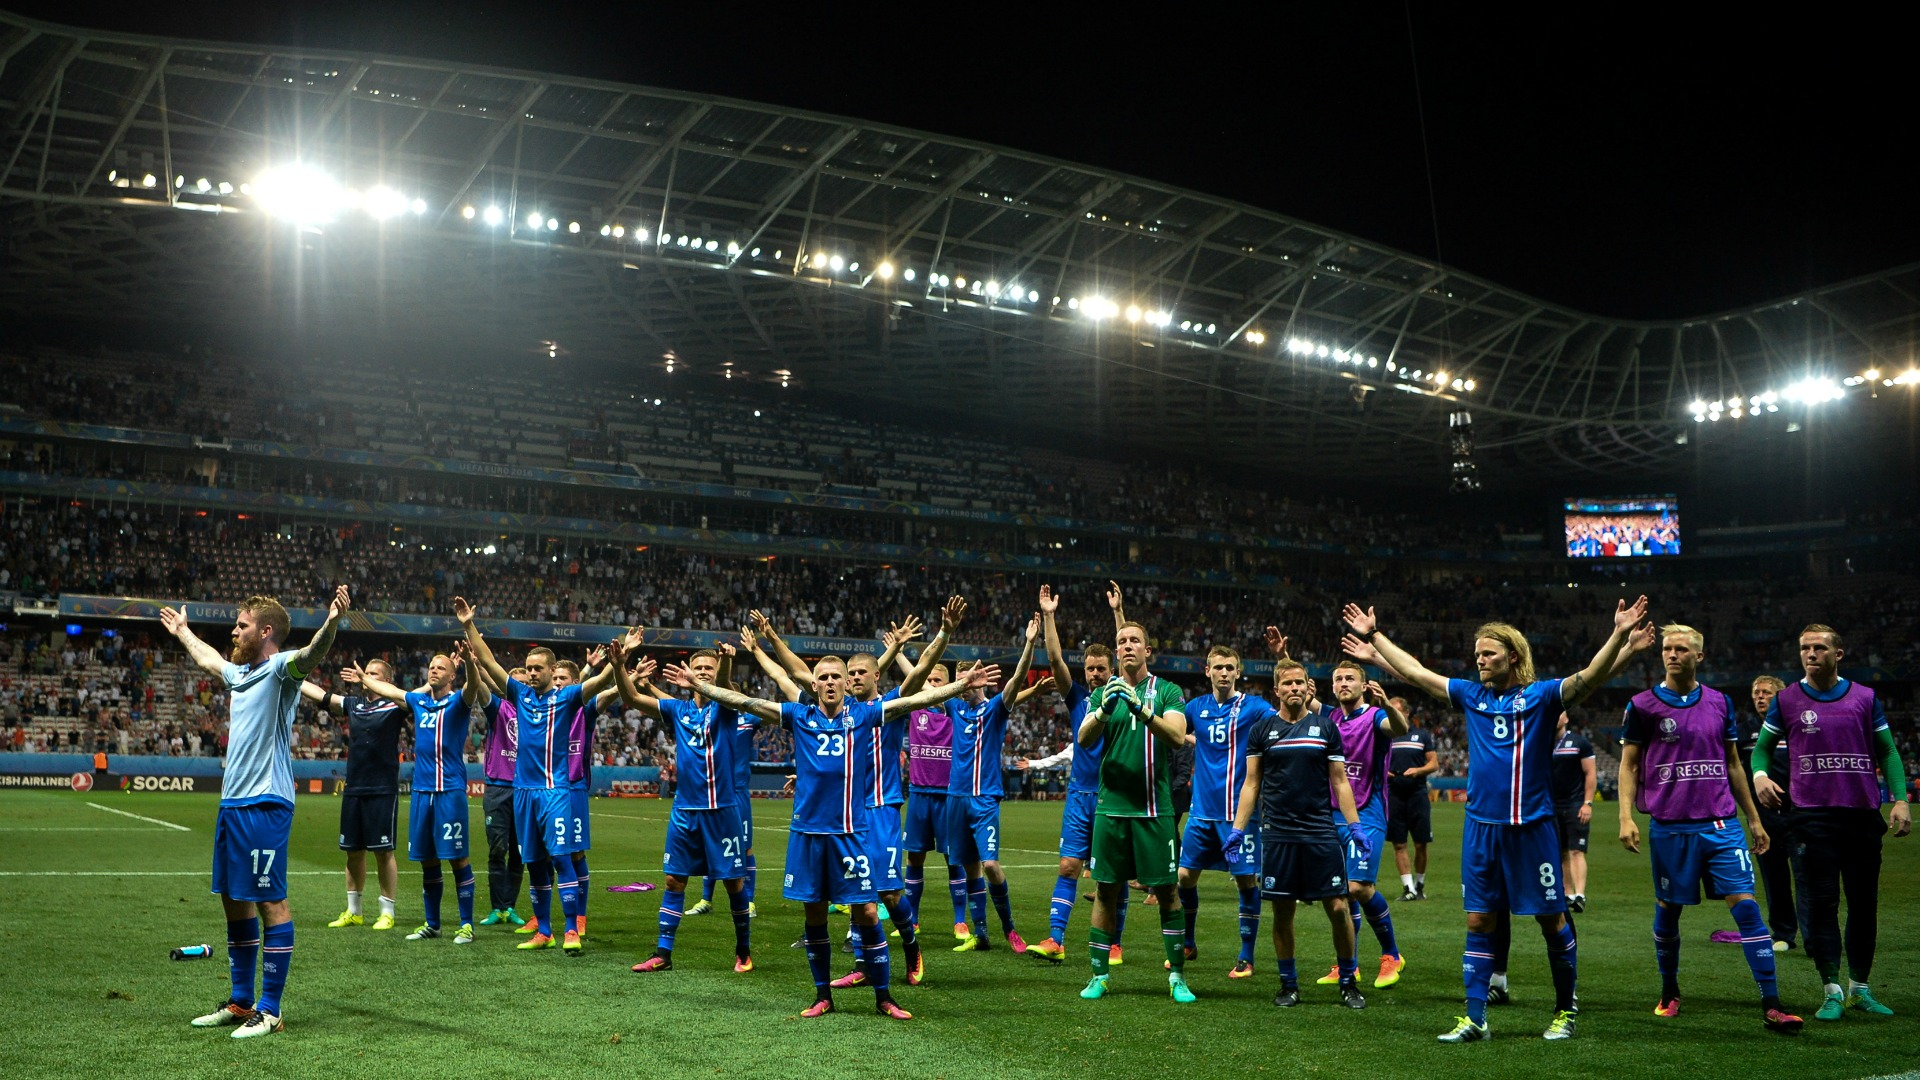 Wwe 3d Live Wallpaper Iceland National Football Team Wallpapers